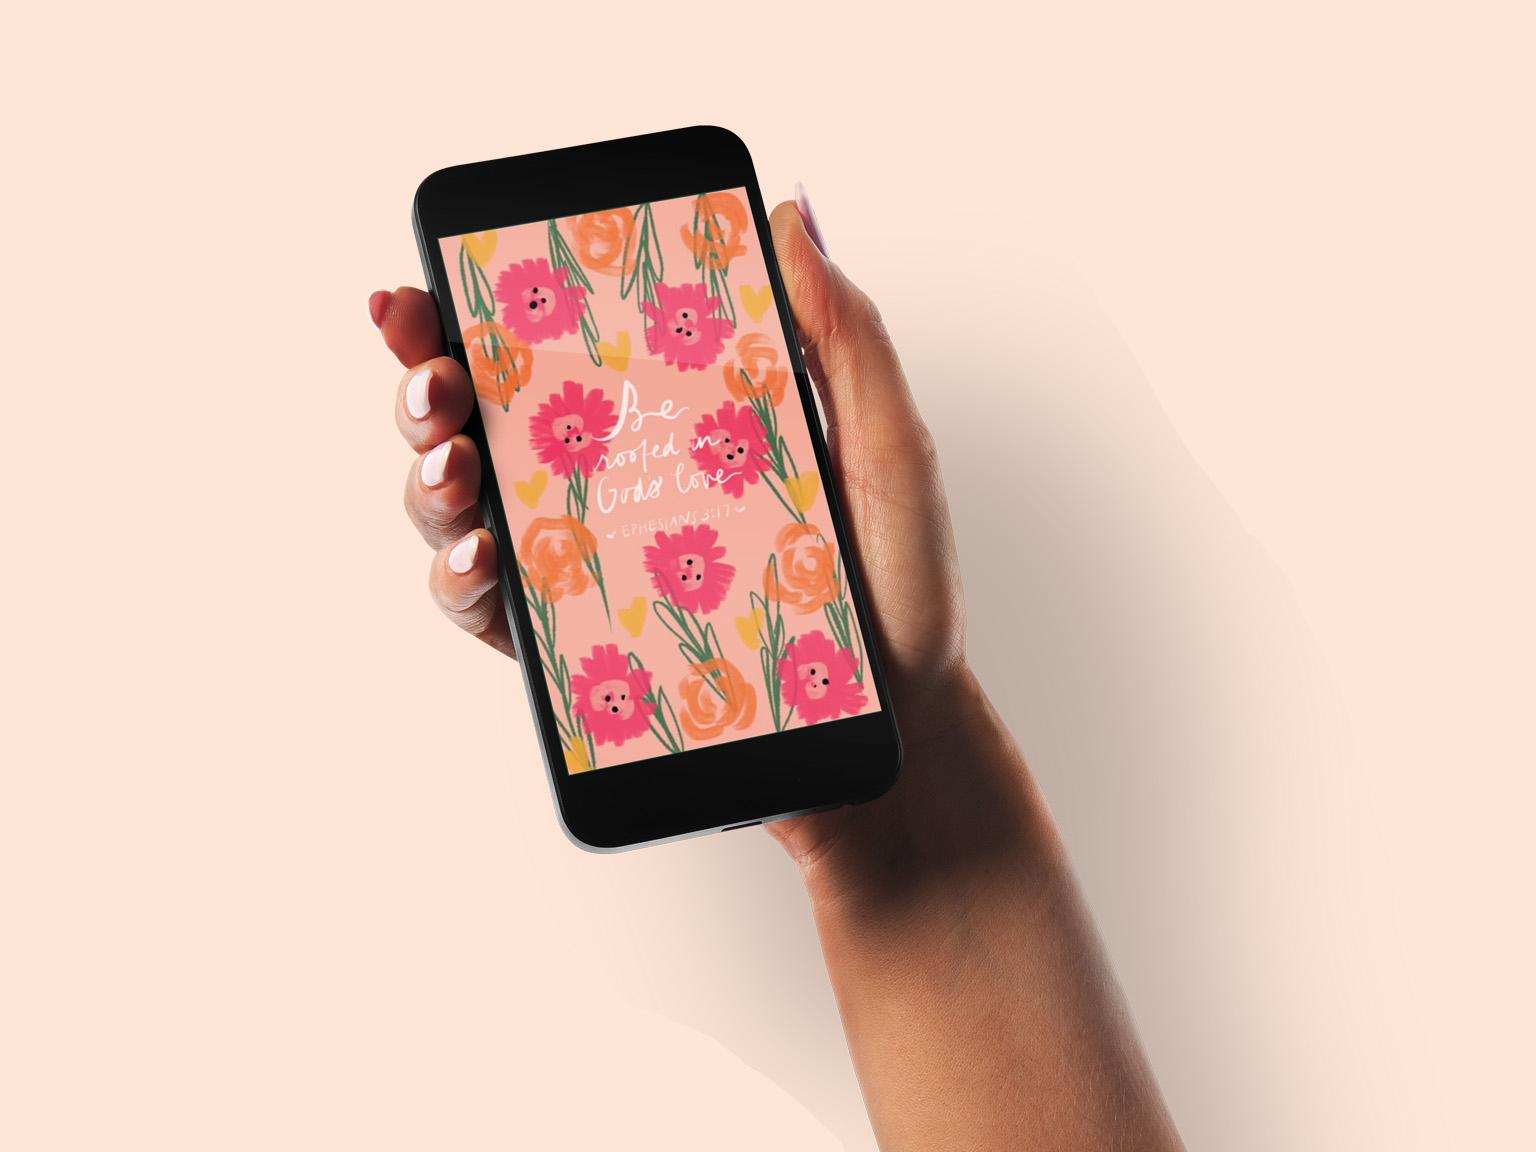 Wall Flower flowers digital pattern design illustration